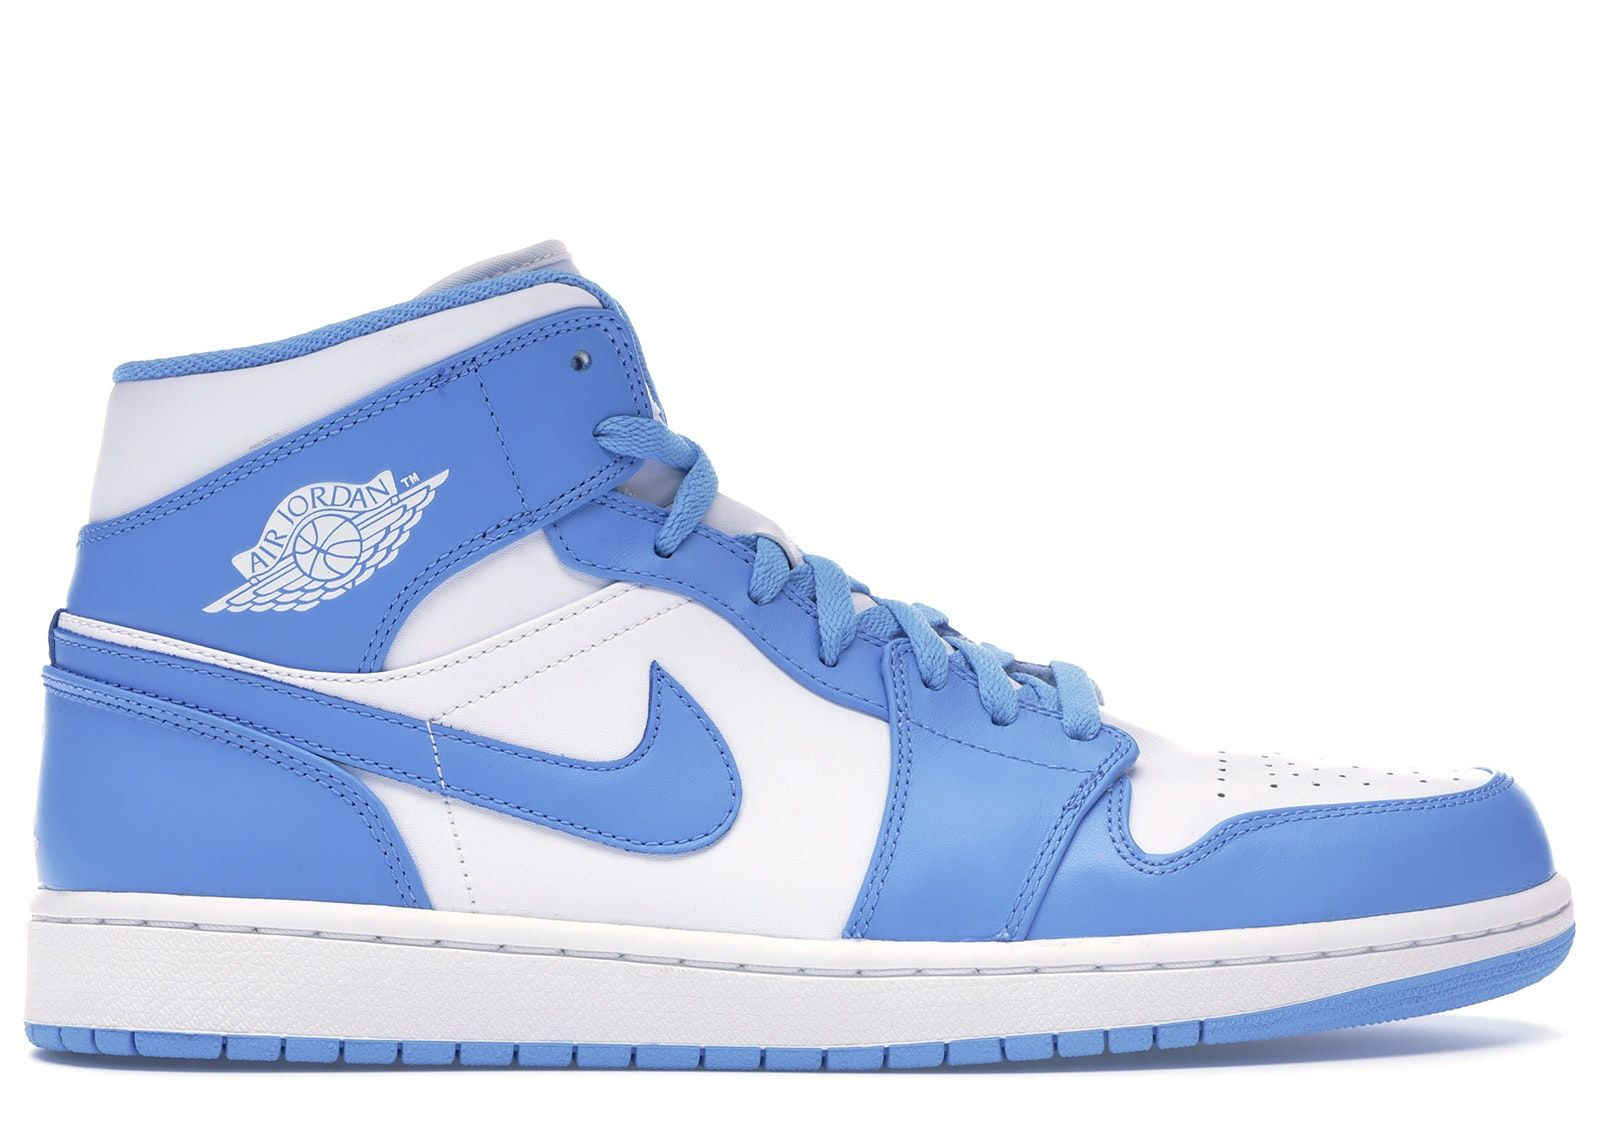 Guarda Jordan 1 Retro Mid Unc Disponibile Su Stockx Jordan Shoes Girls Blue Jordans Blue And White Jordans